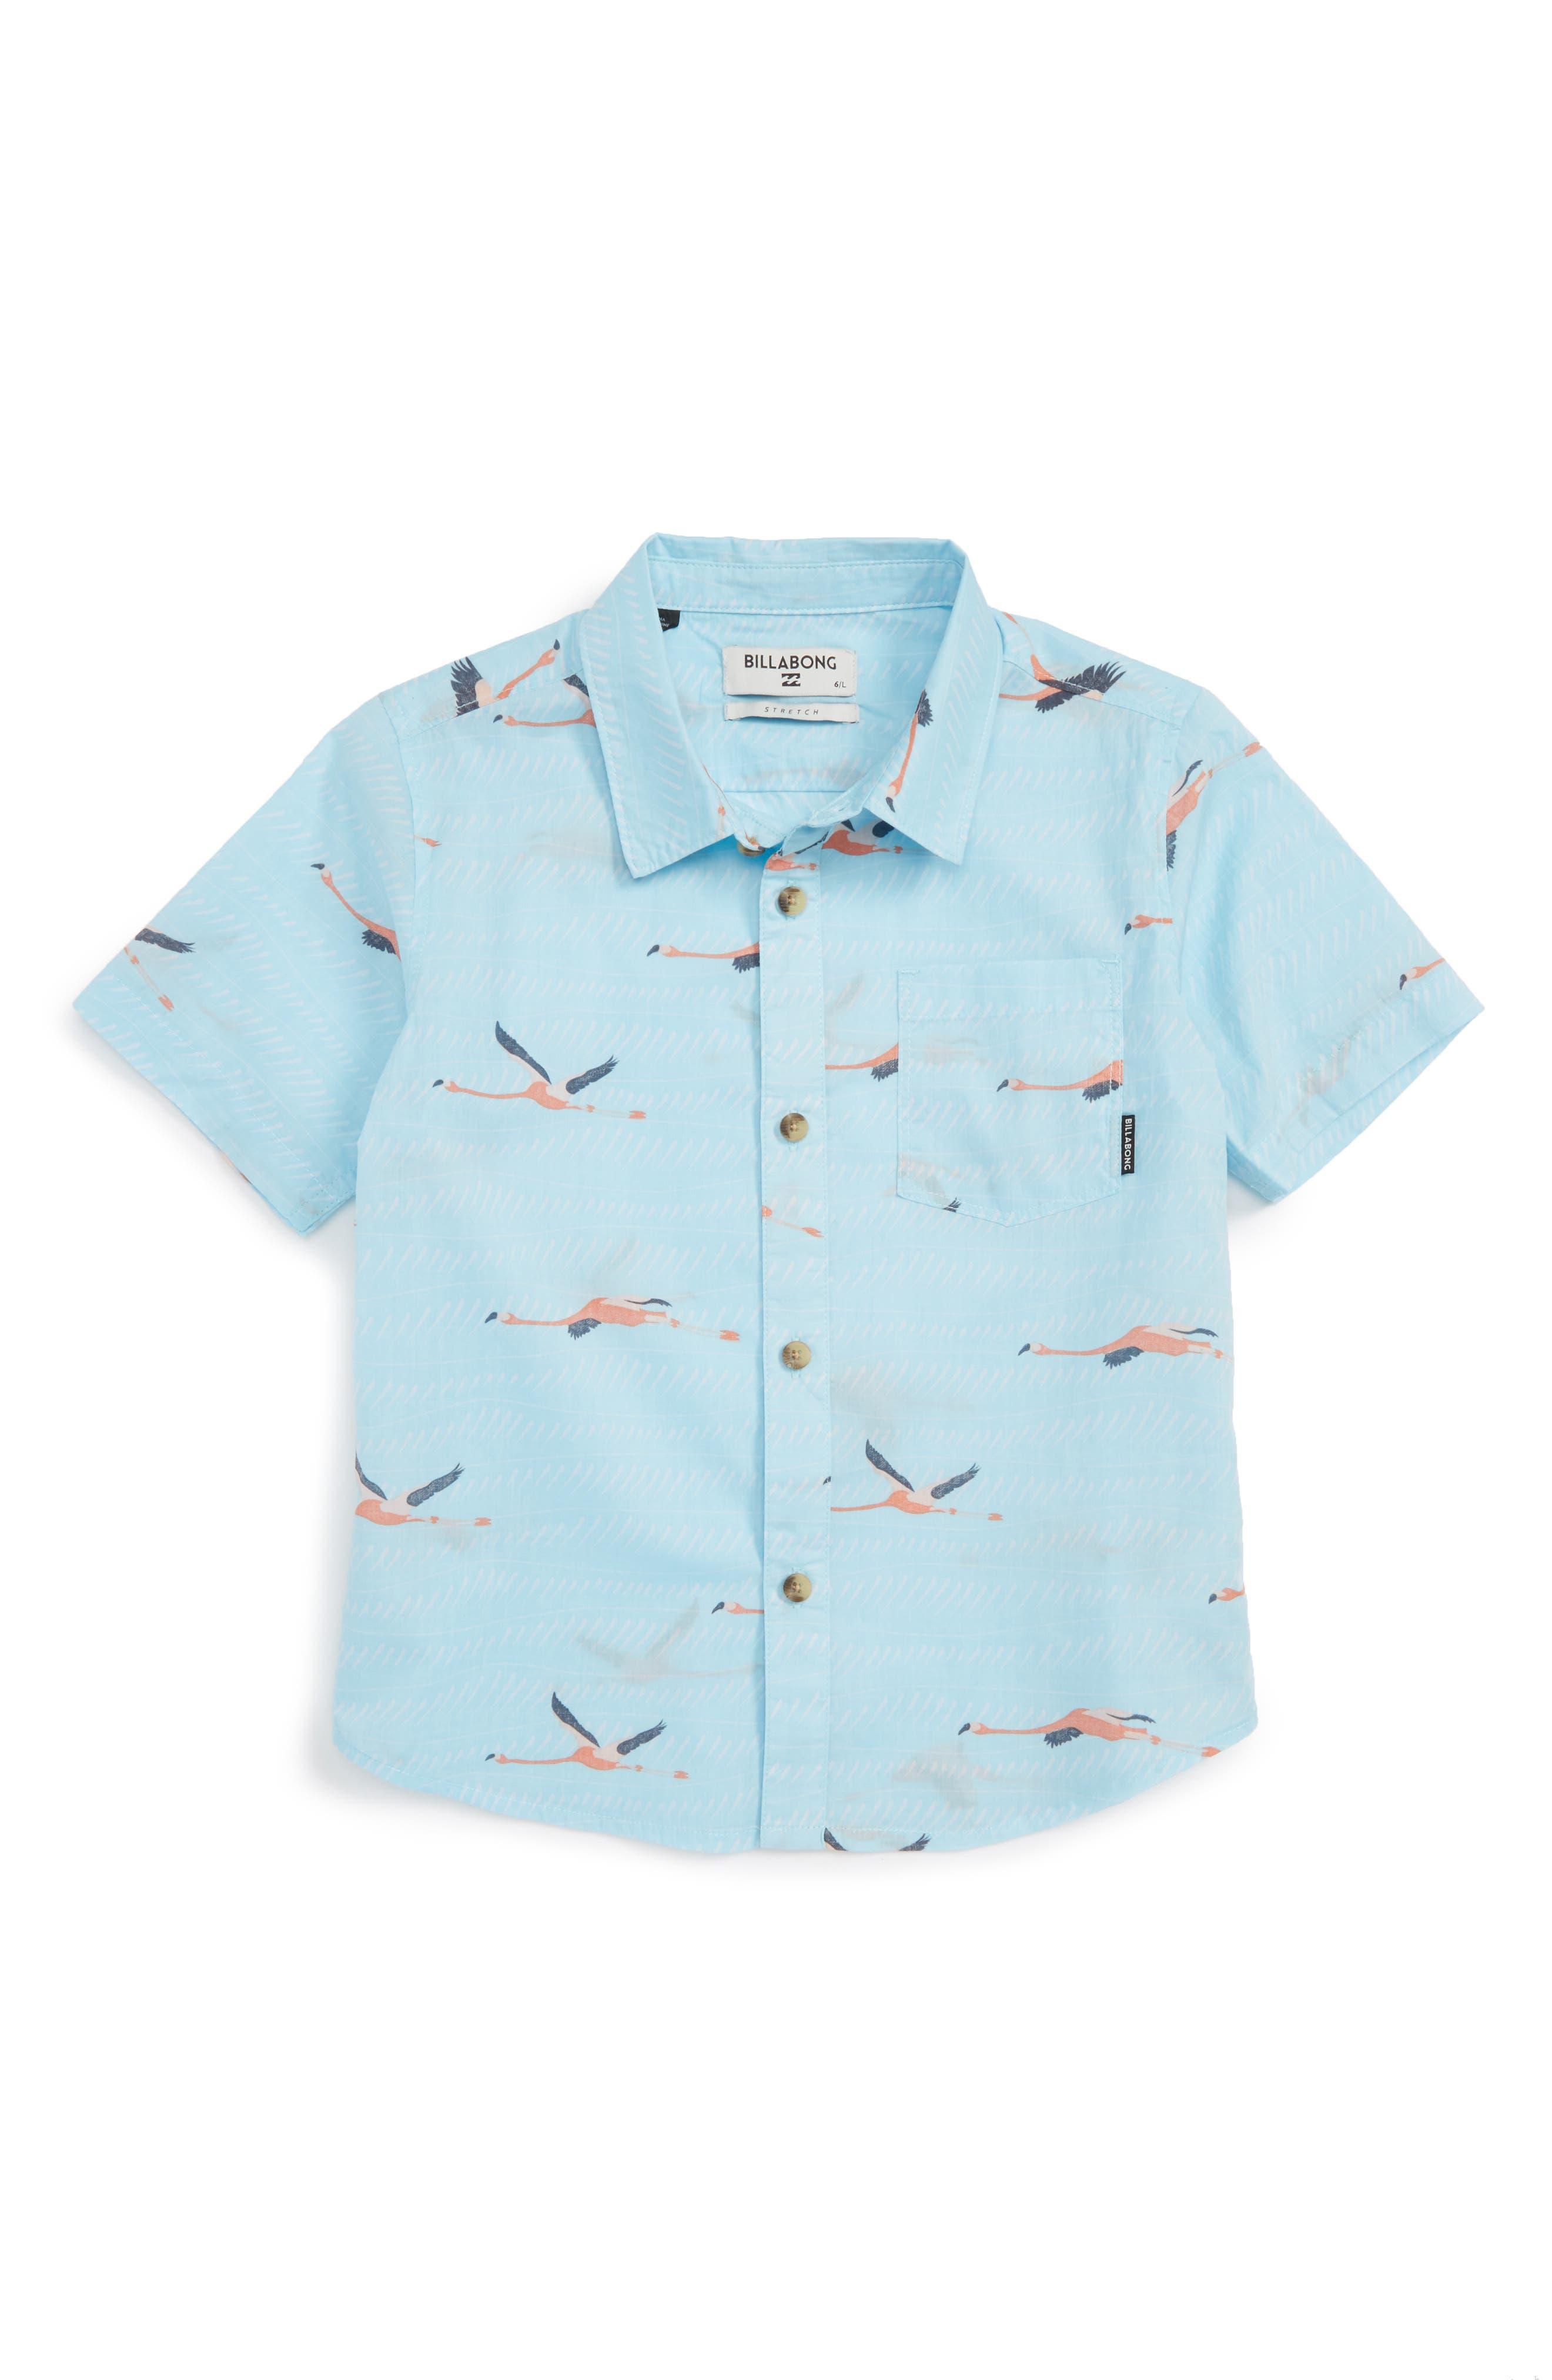 Billabong Vacay Woven Shirt (Toddler Boys & Little Boys)